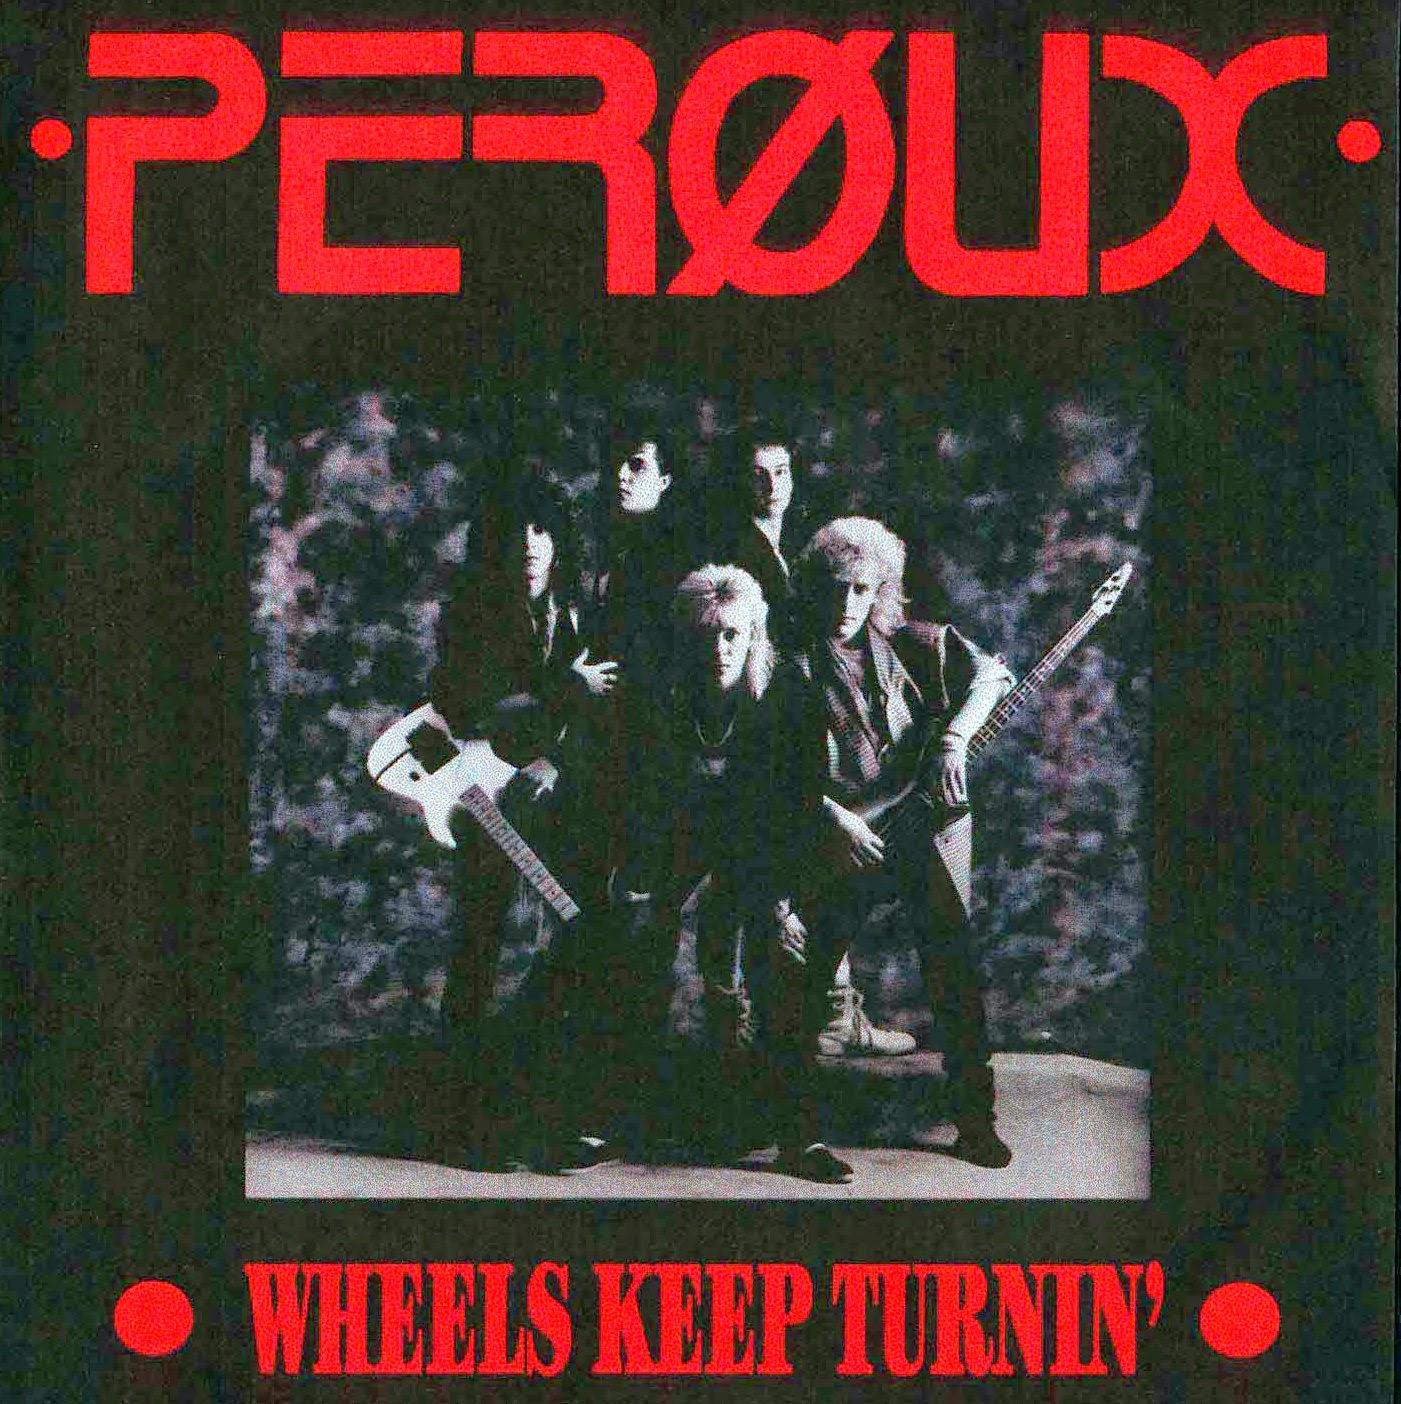 Peroux Wheels keep turning 1988